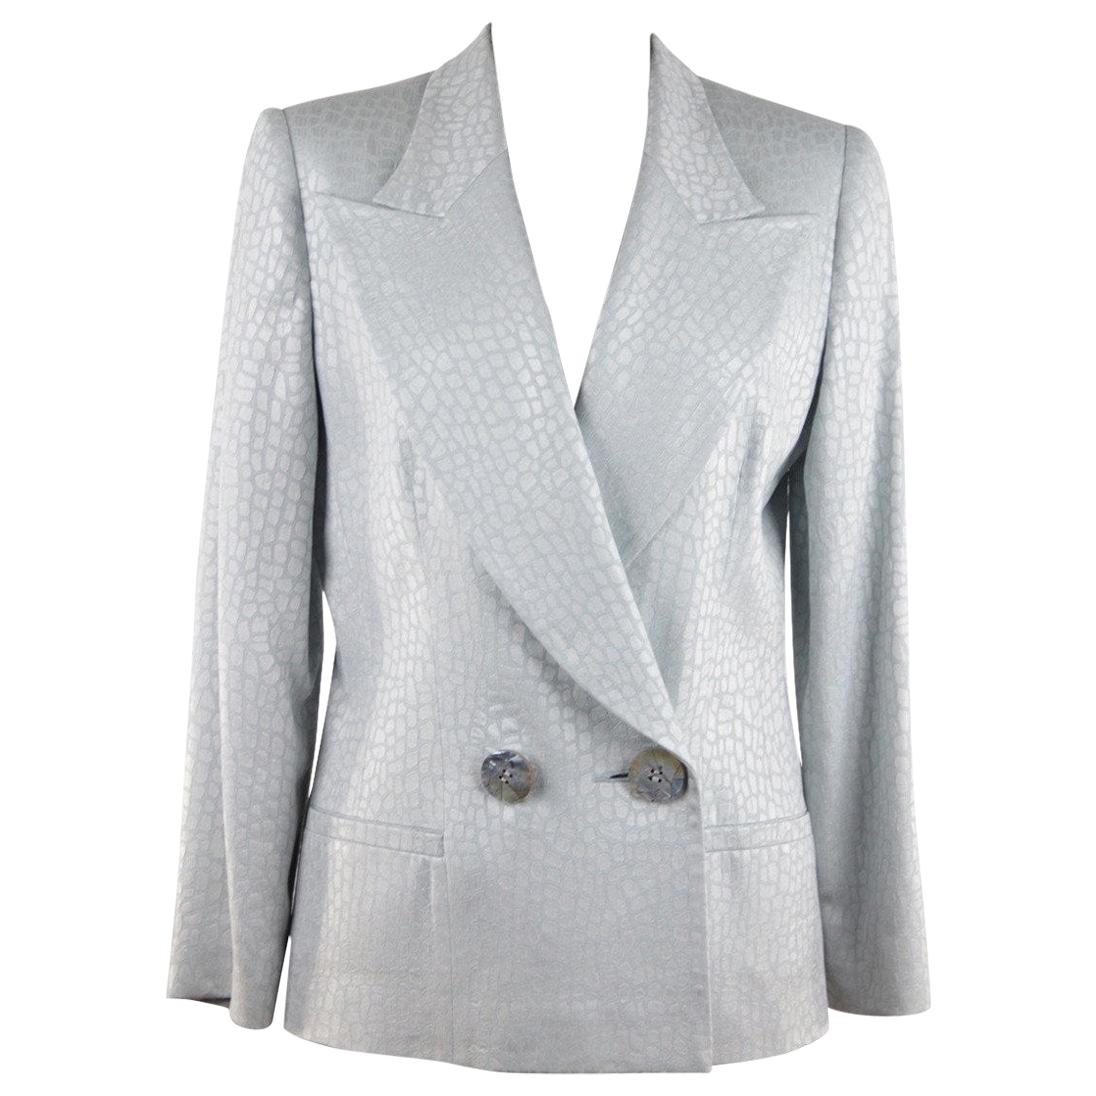 GAI MATTIOLO Baby Blue CROC LOOK Double Breasted BLAZER Jacket SZ 42 IT GT